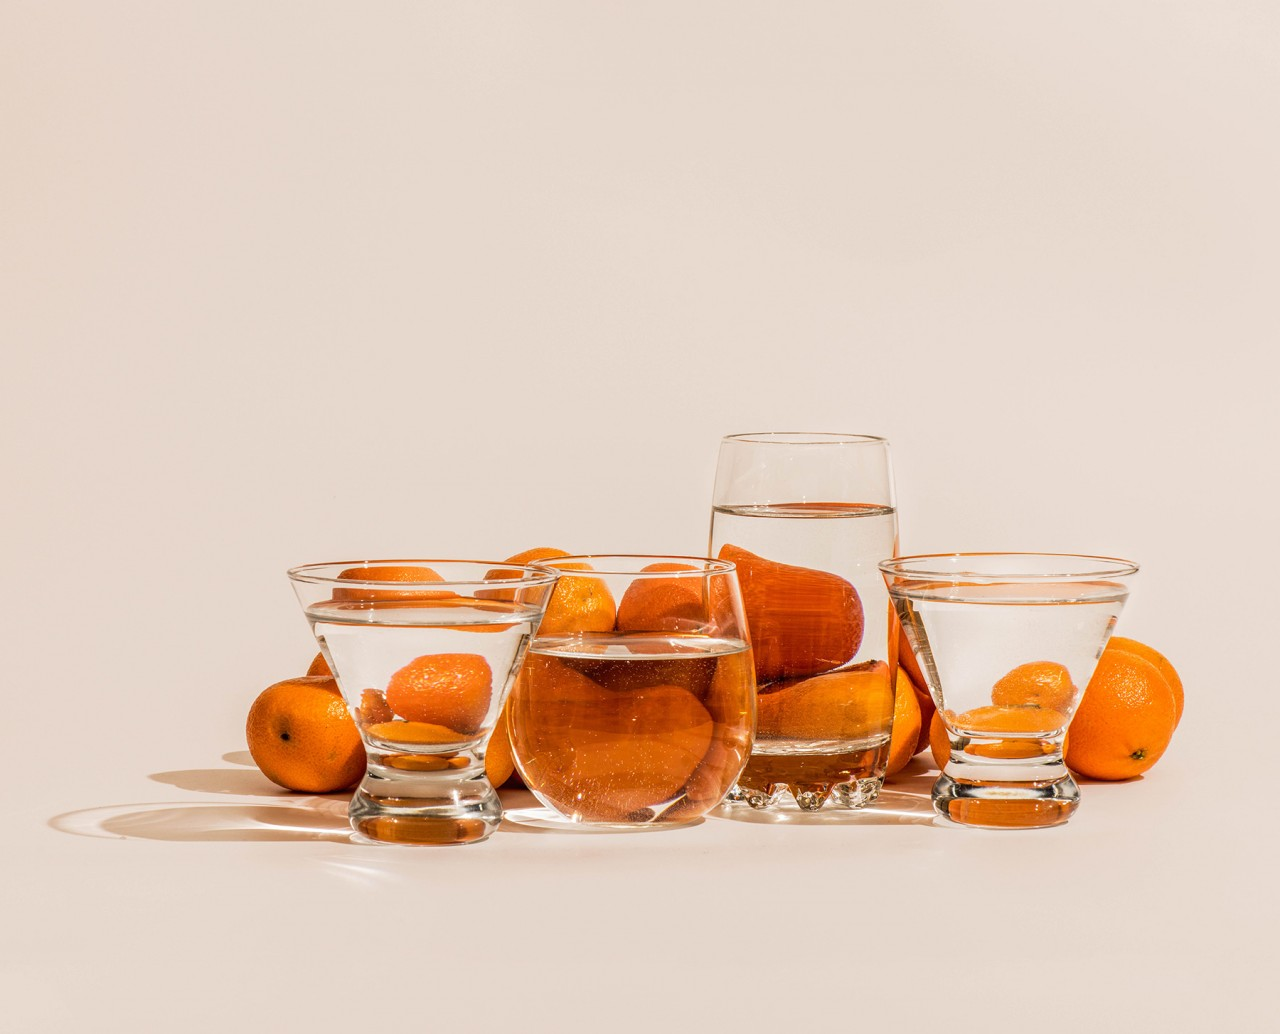 Tangerines.SuzanneSaroff-640x517@2x